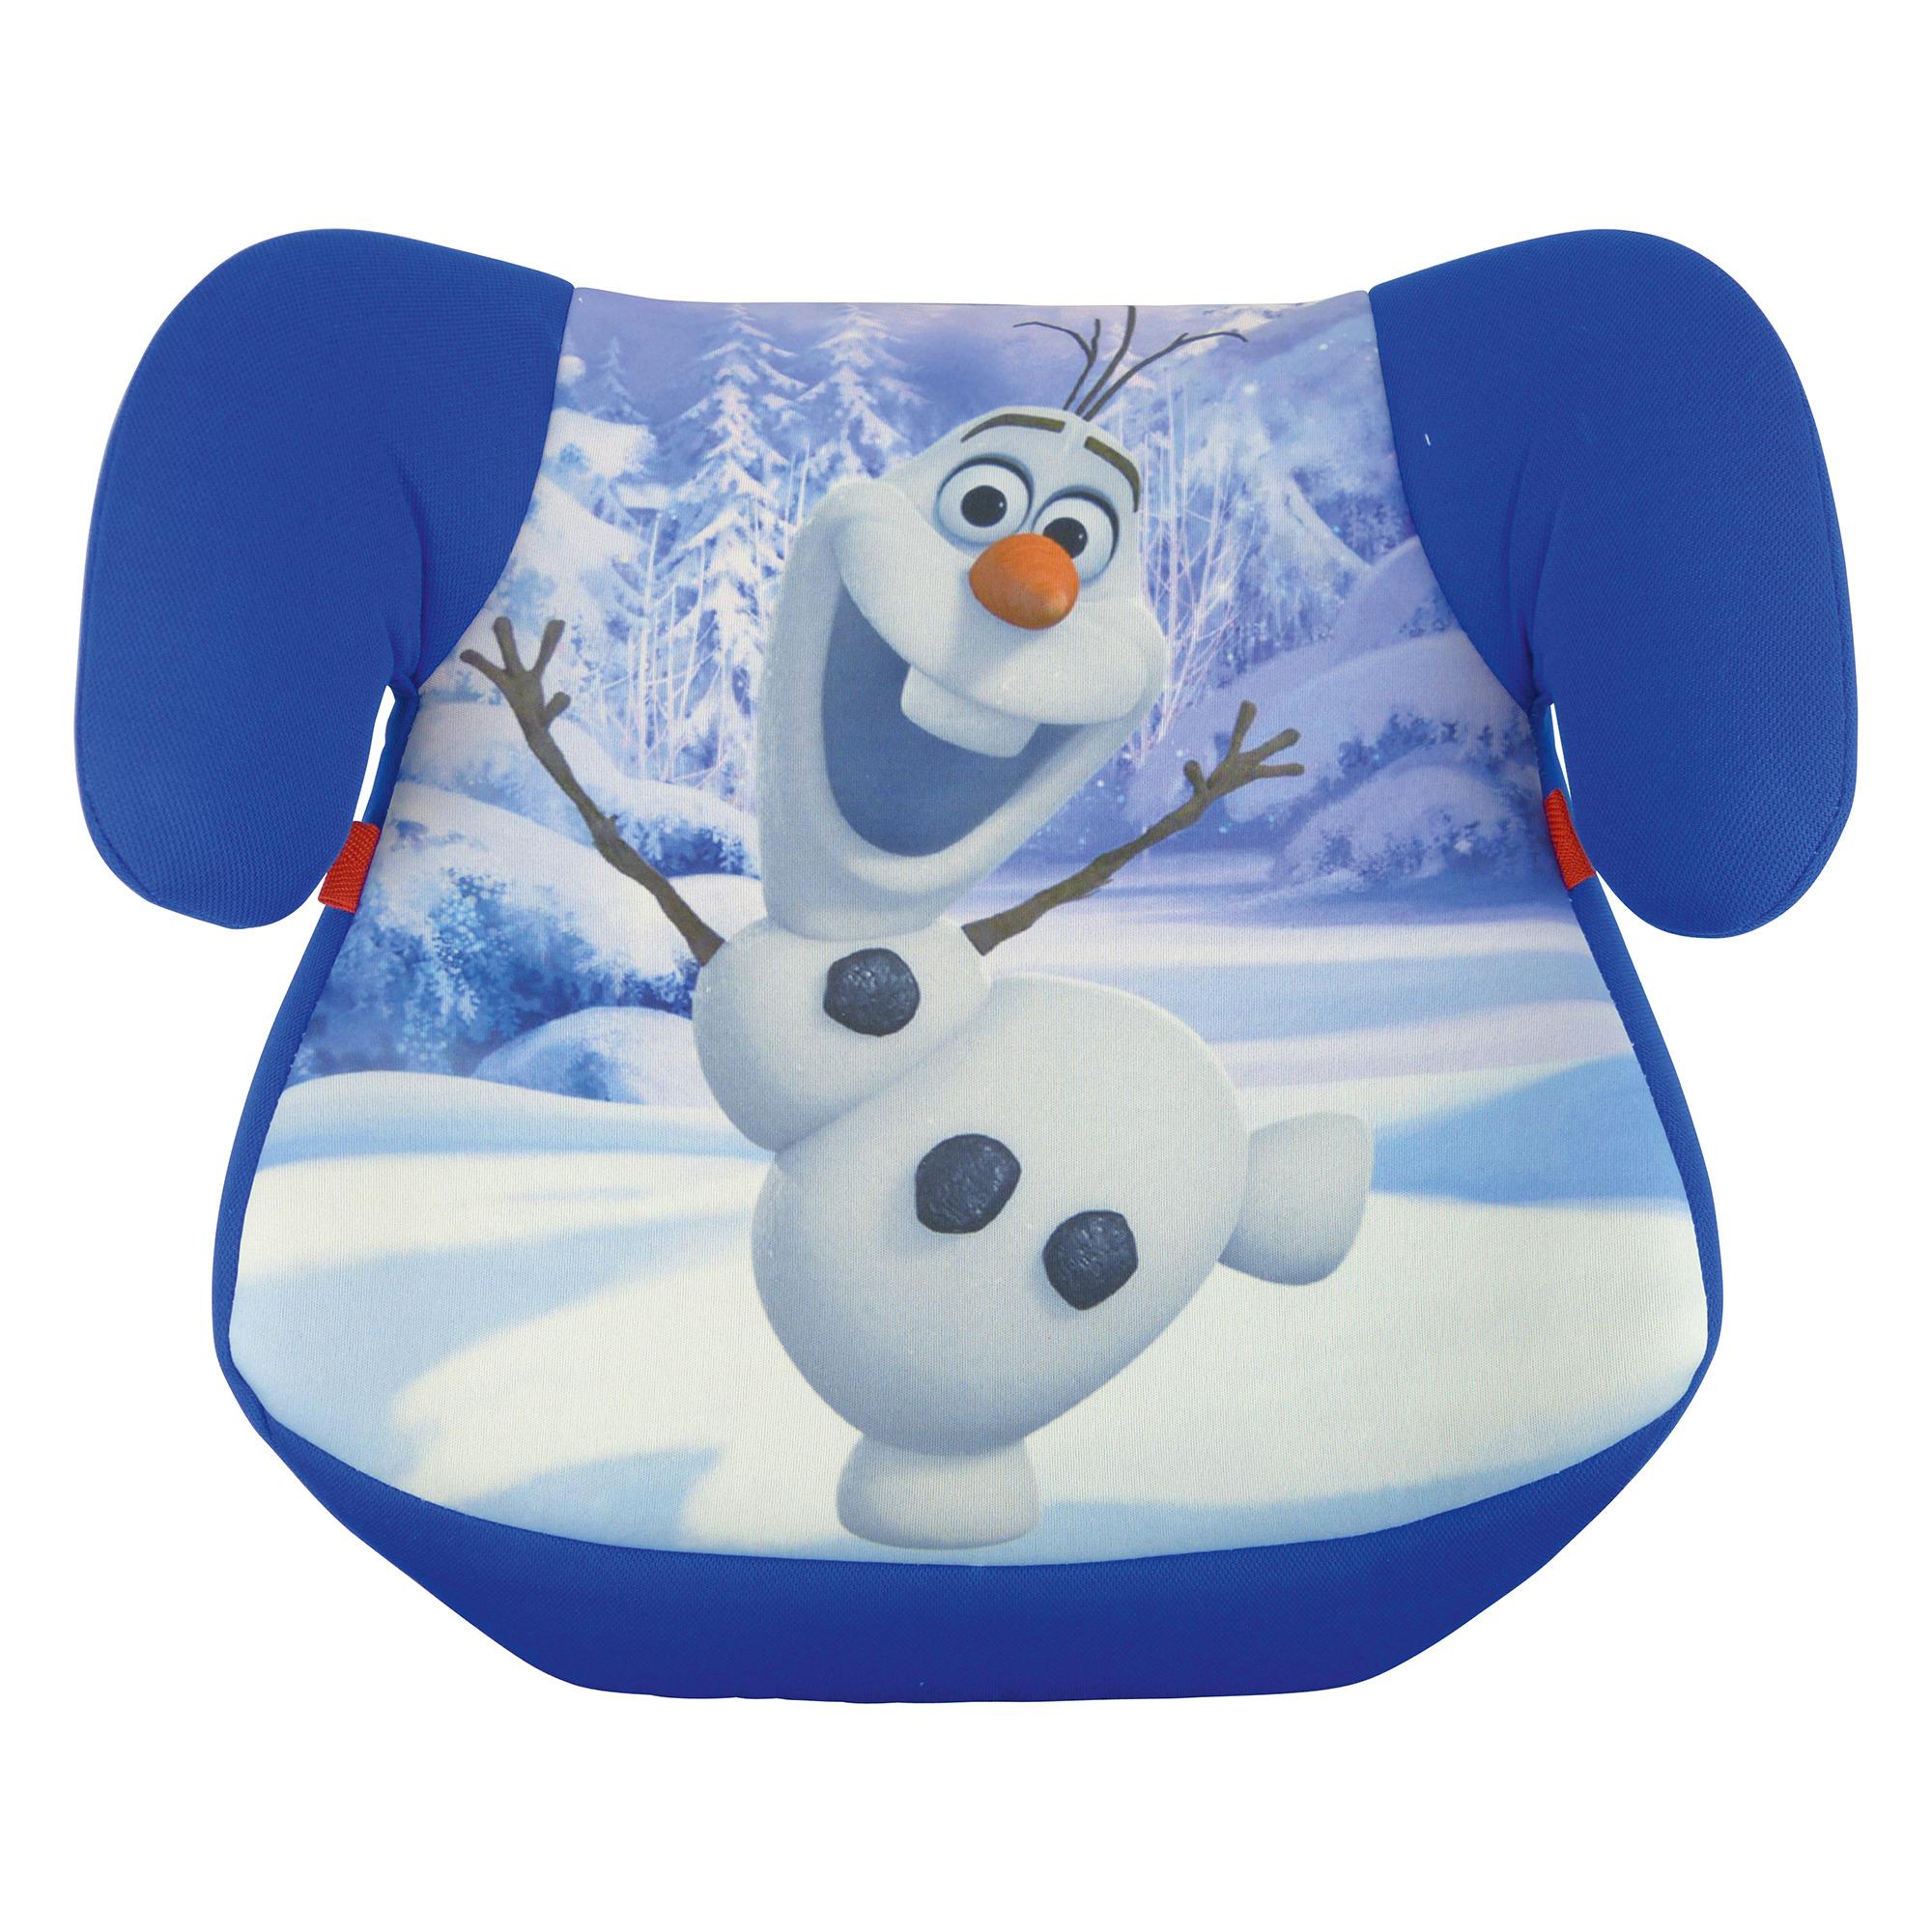 Booster-Zitverhoger Azet Disney Frozen Olaf blauw